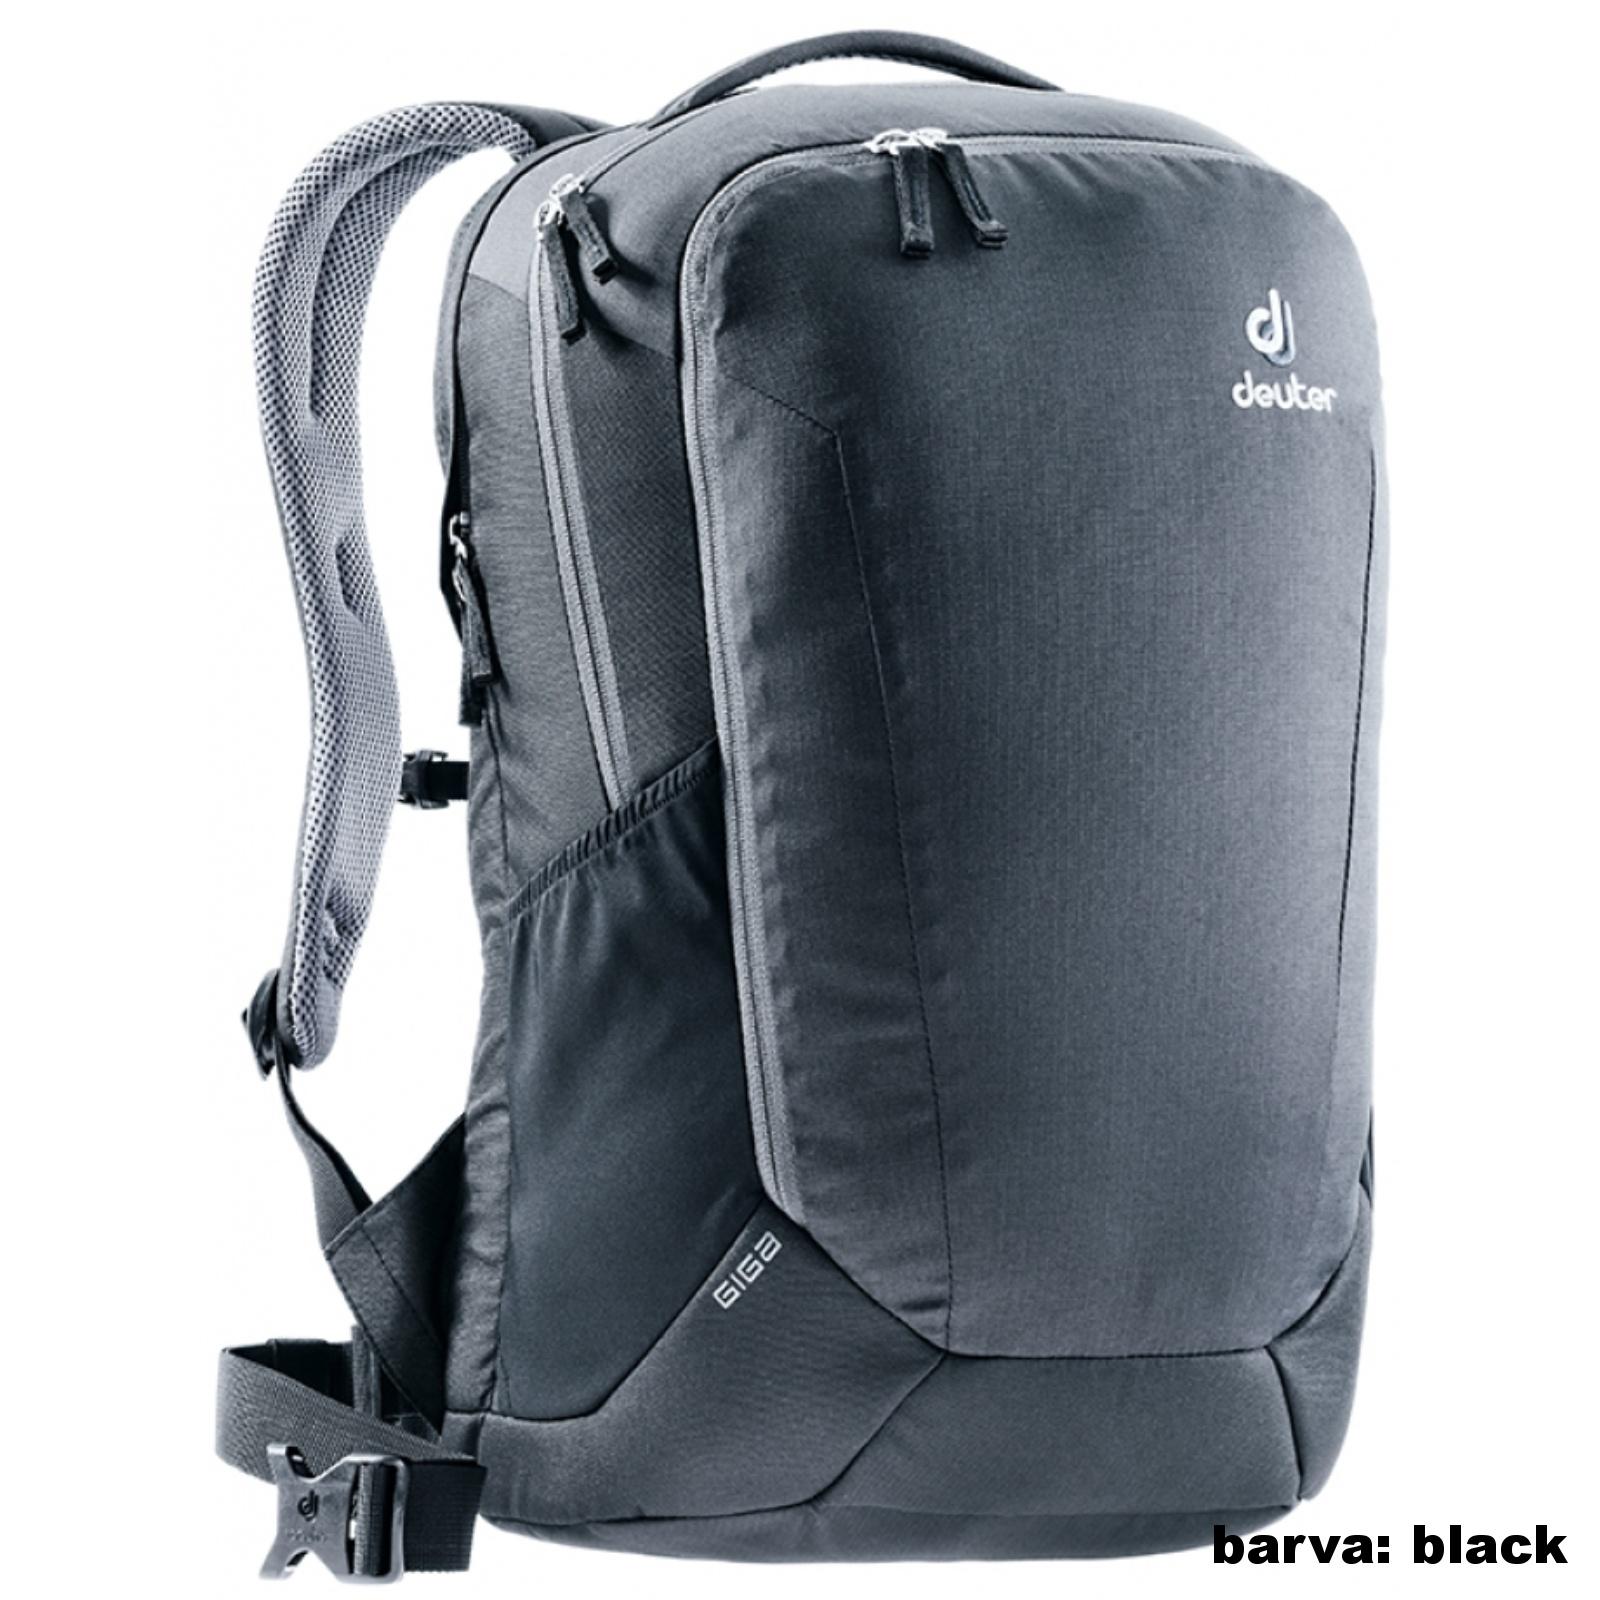 8b99bbcd96 Batoh DEUTER Giga - black